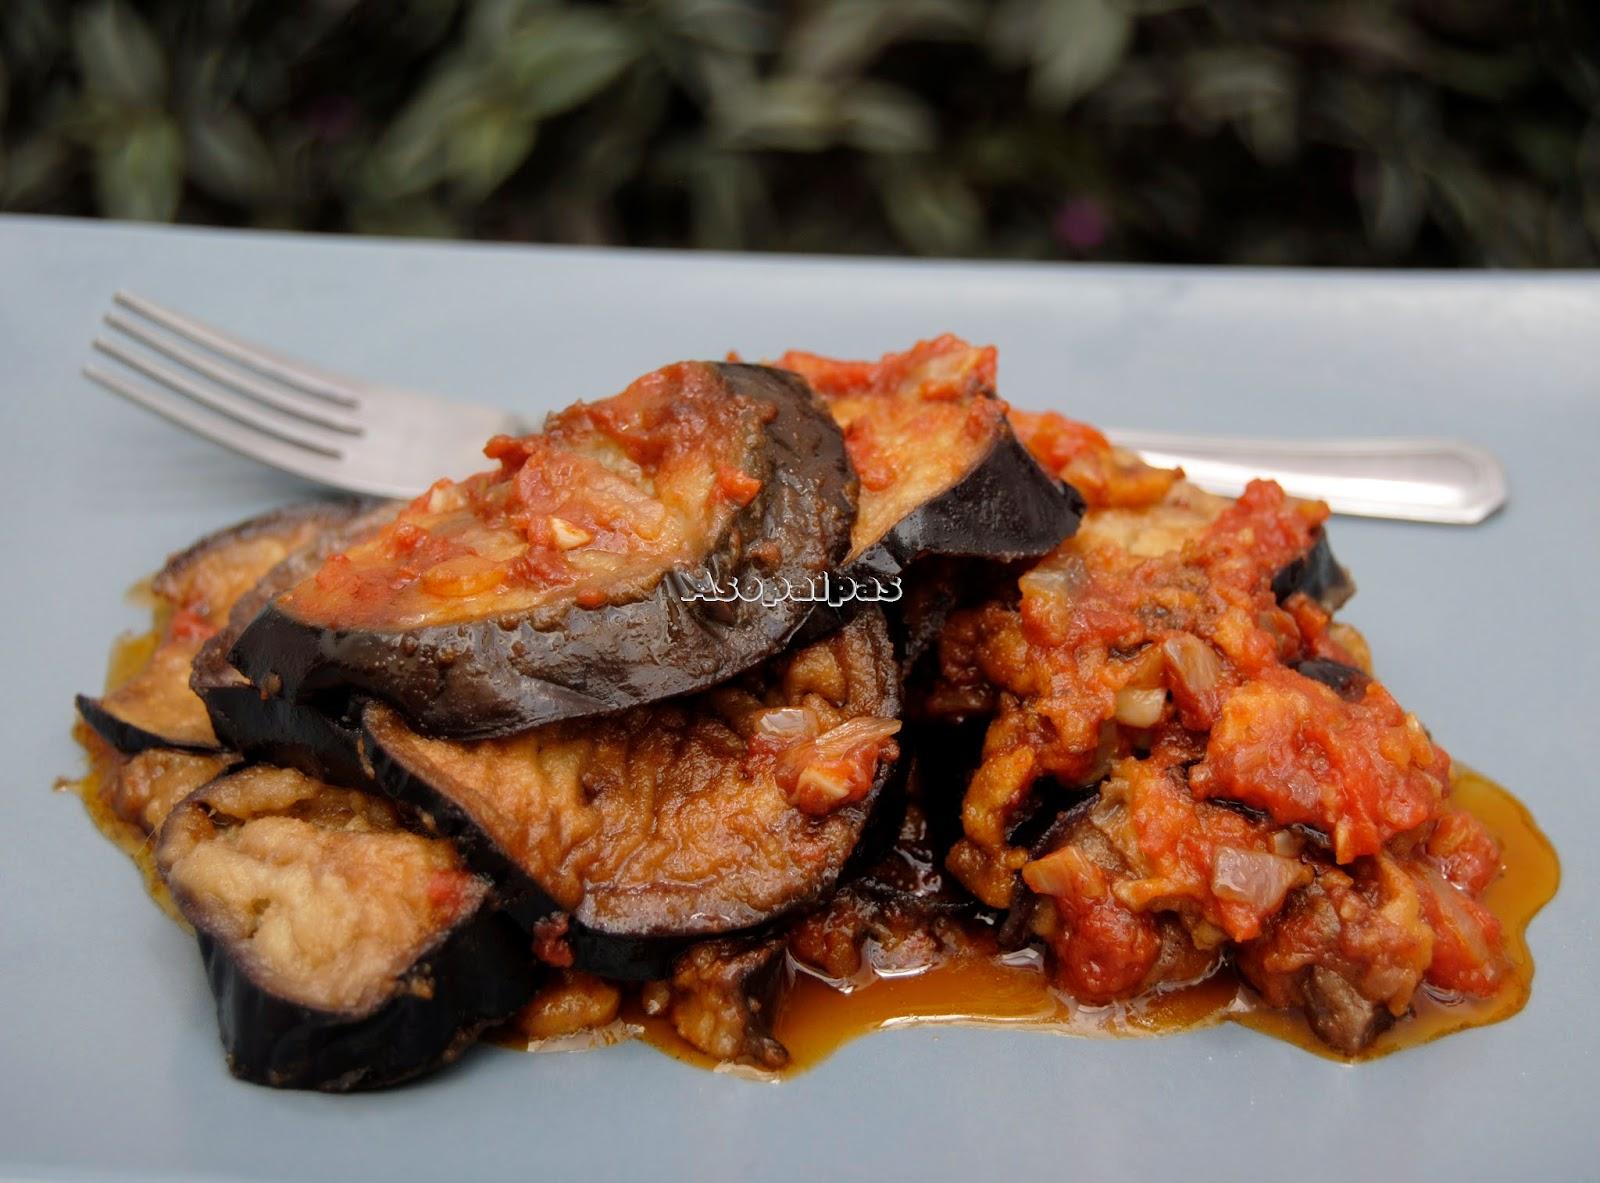 Berenjenas con Salsa de Tomate